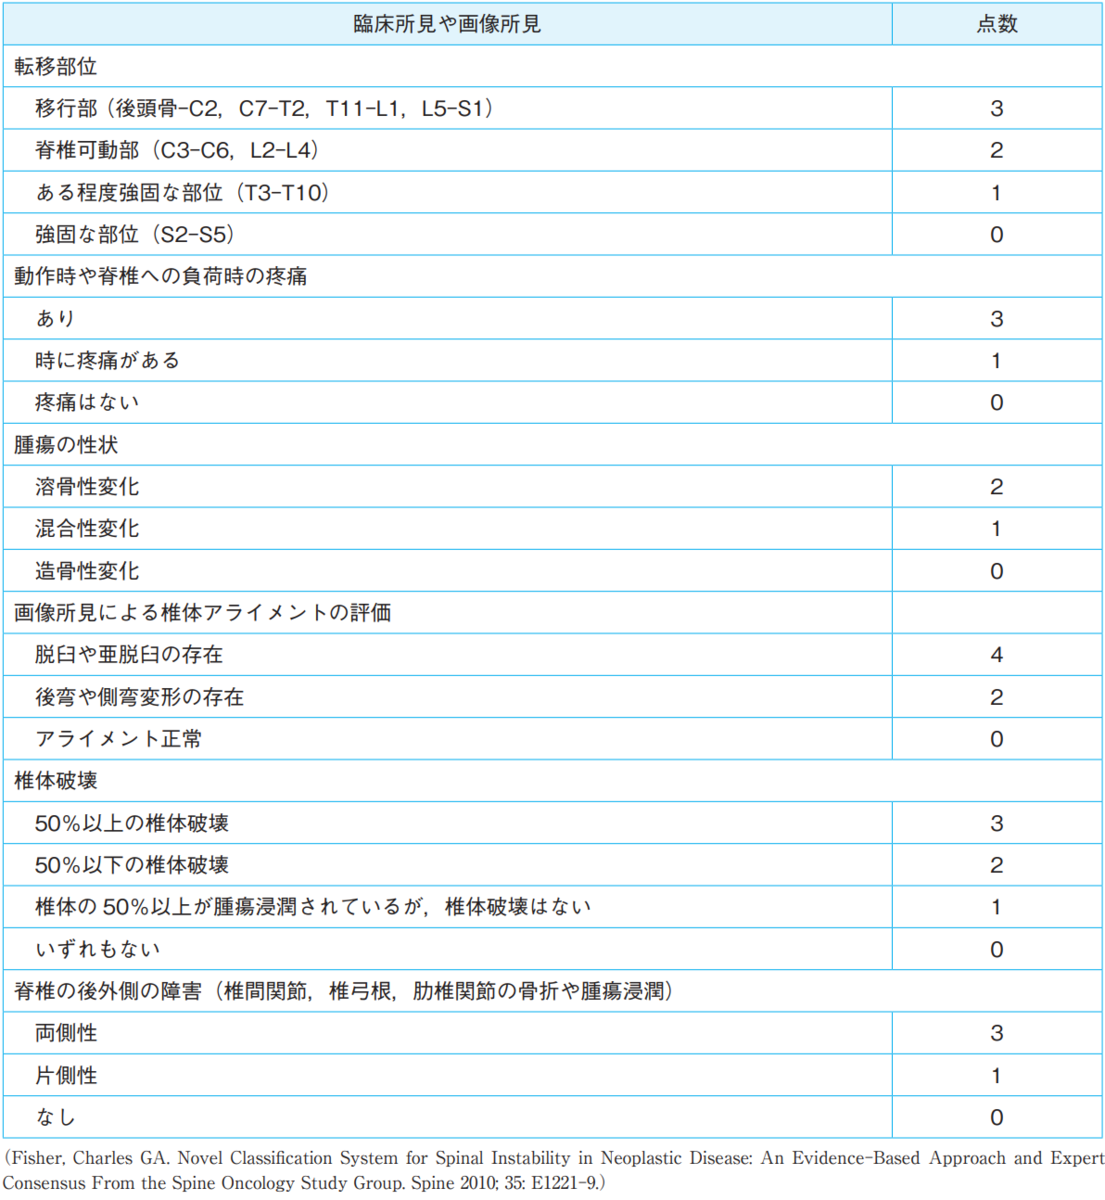 f:id:kenshan123:20200127165257p:plain